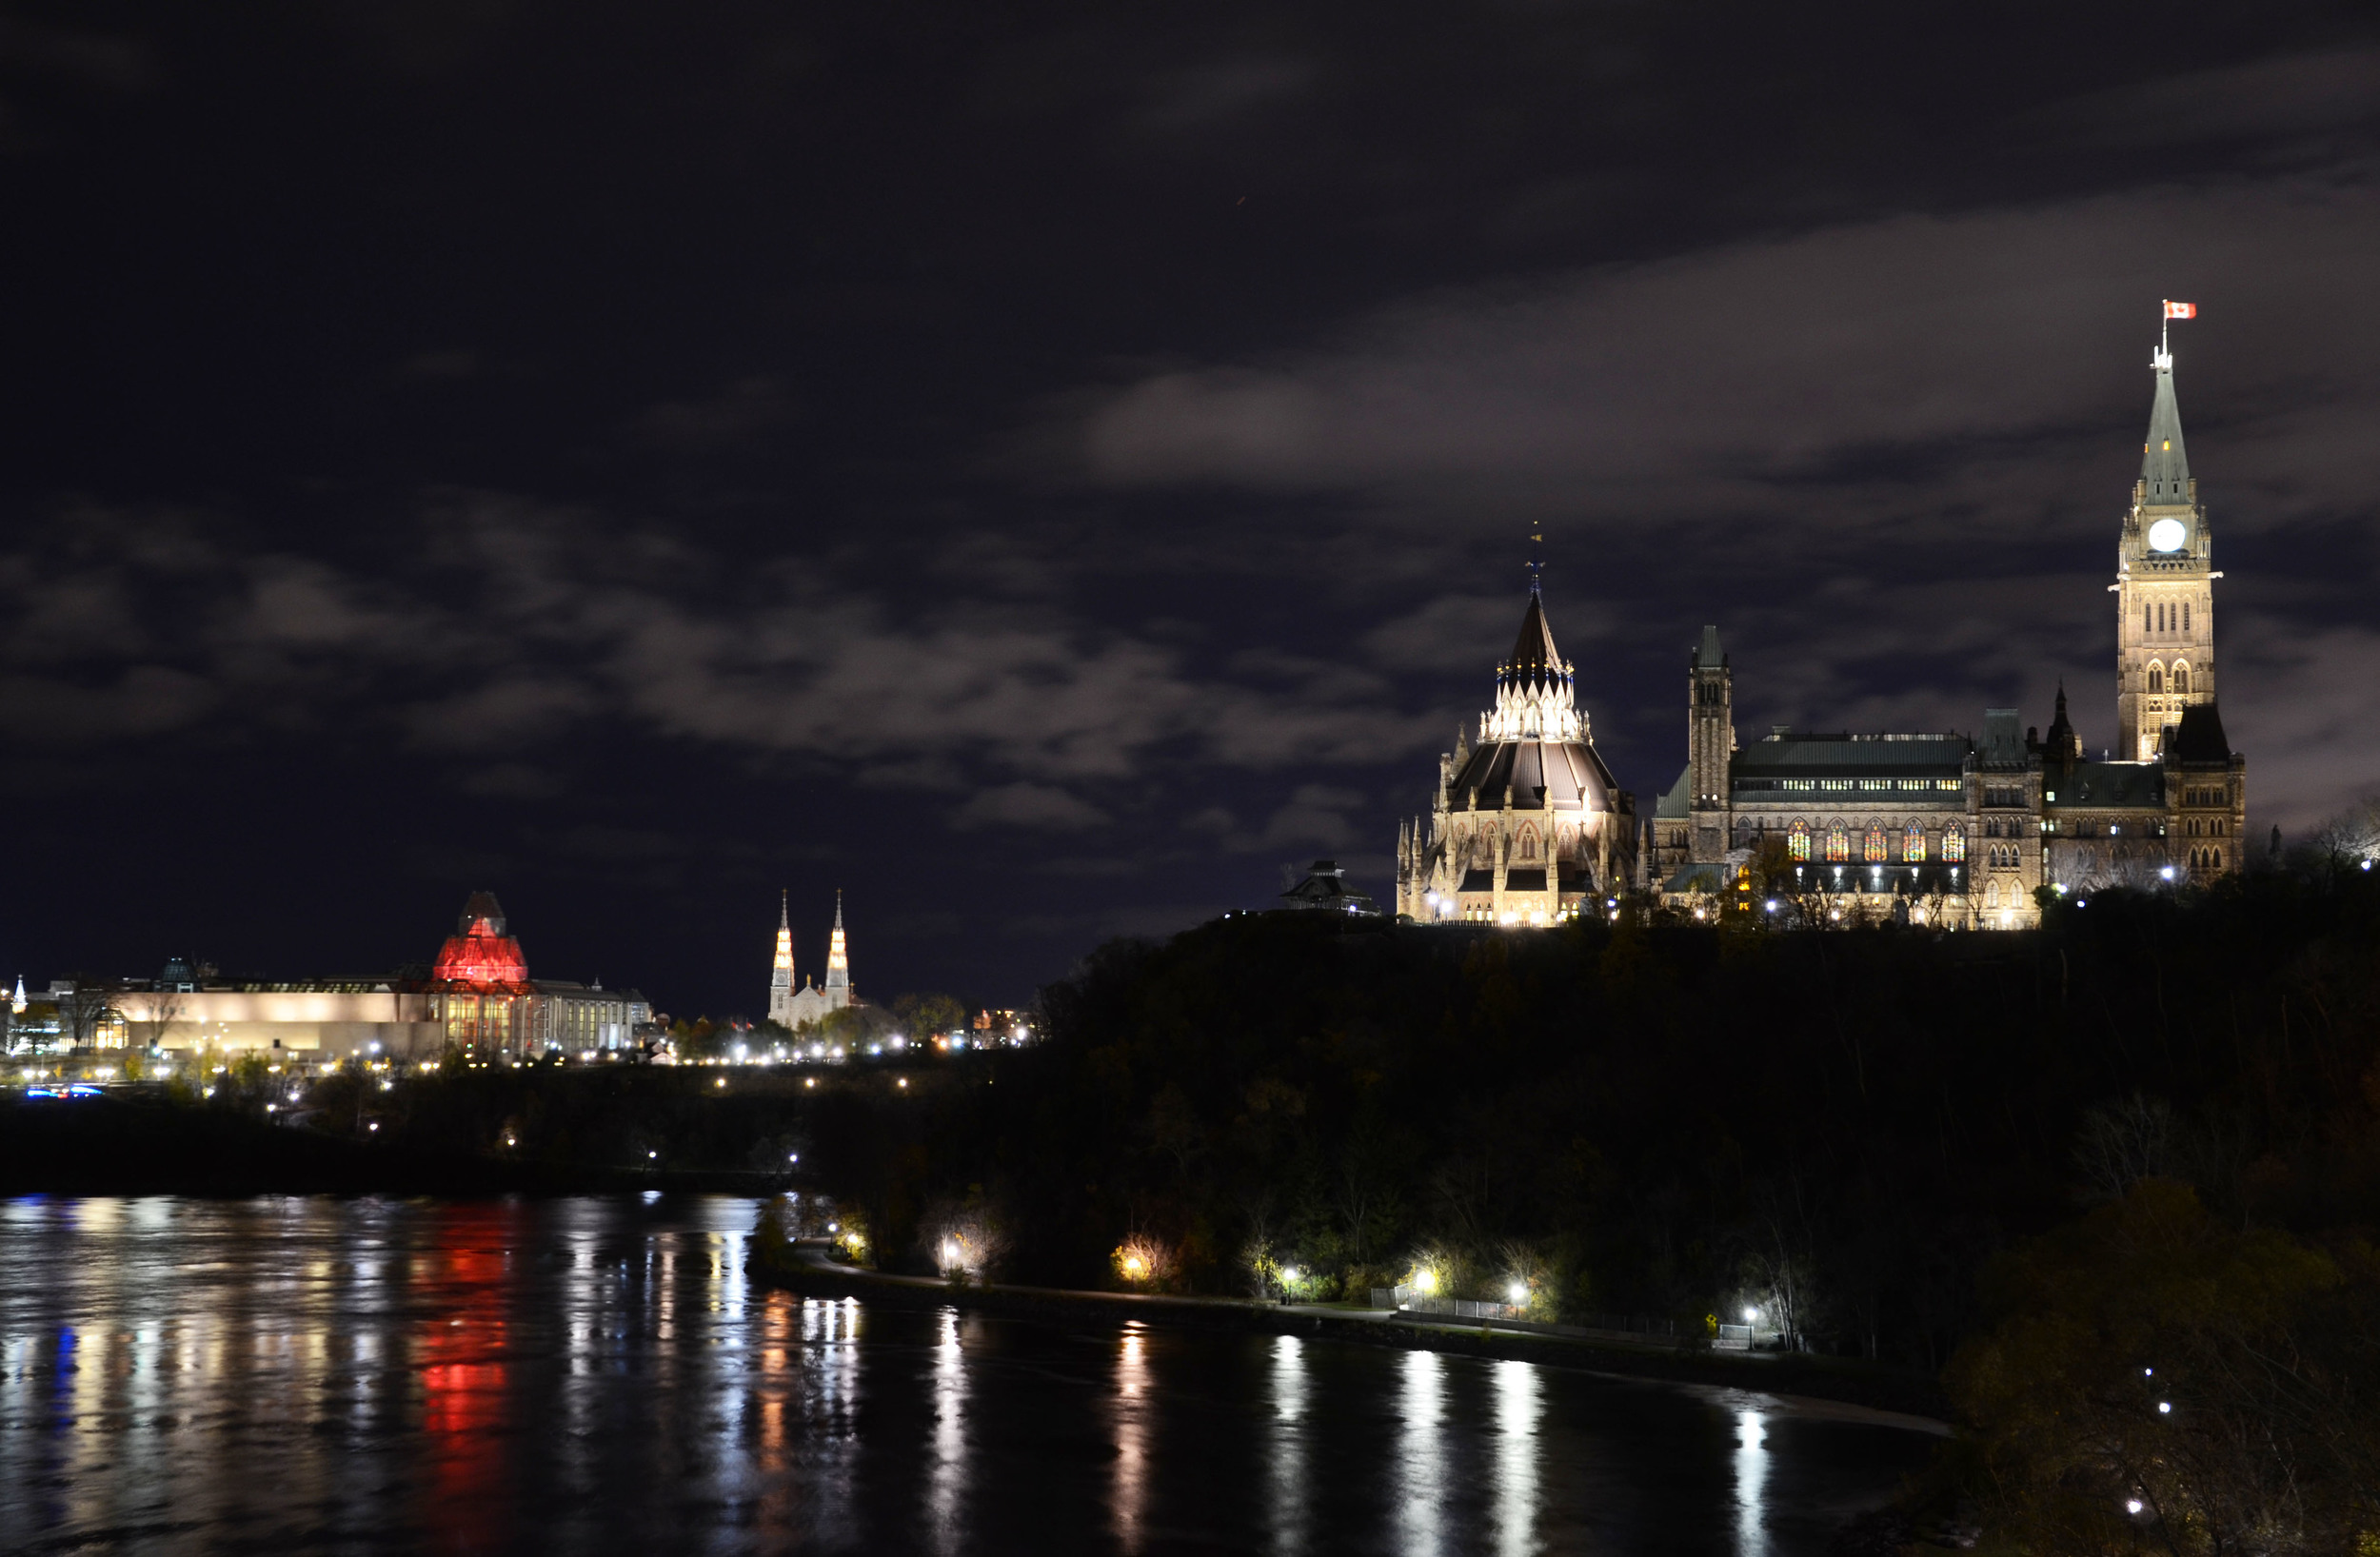 Jenkins, Cheyenne. Parliament Hill . 2012. Digital Photography. Ottawa, Ontario